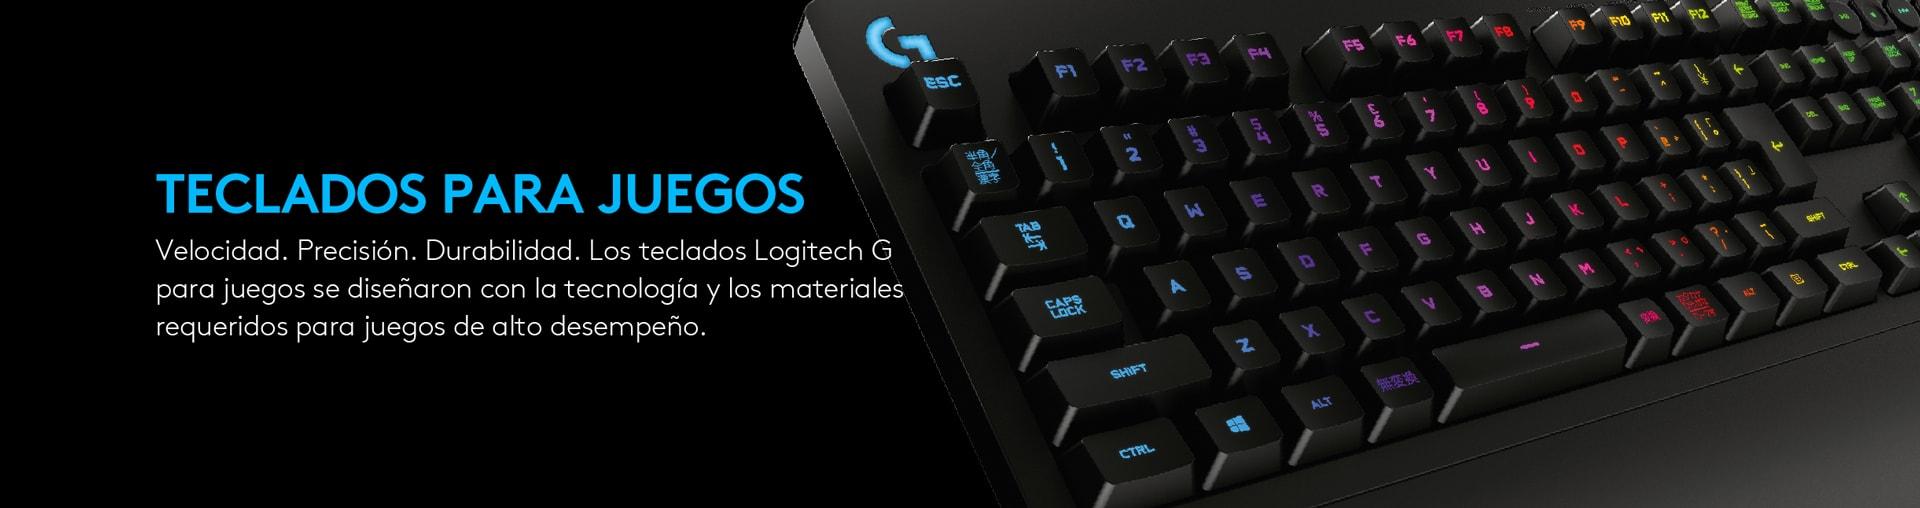 Teclados Logitech G